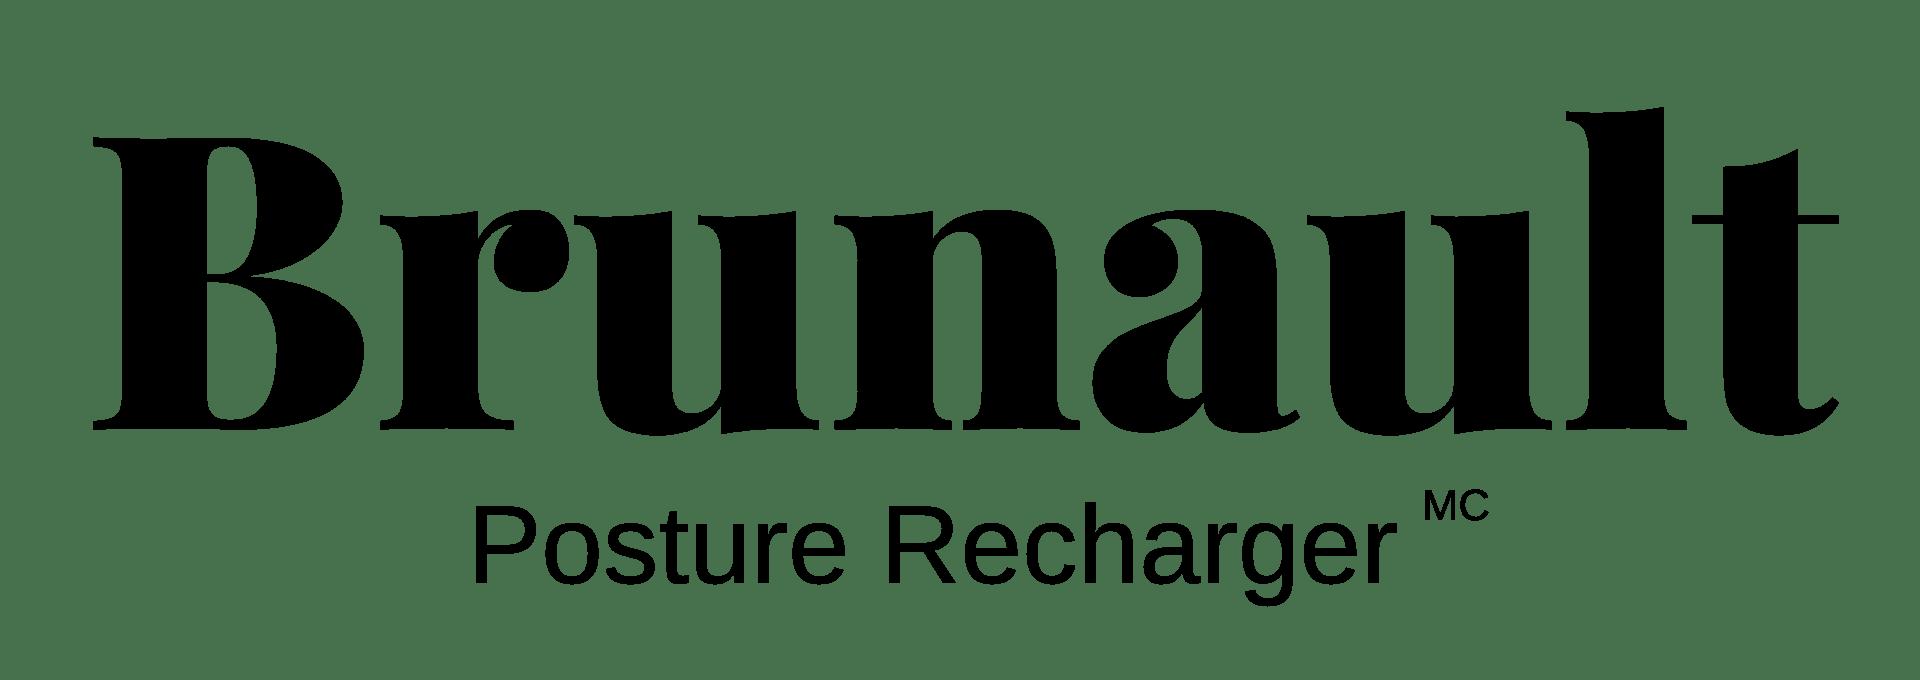 posture recharger